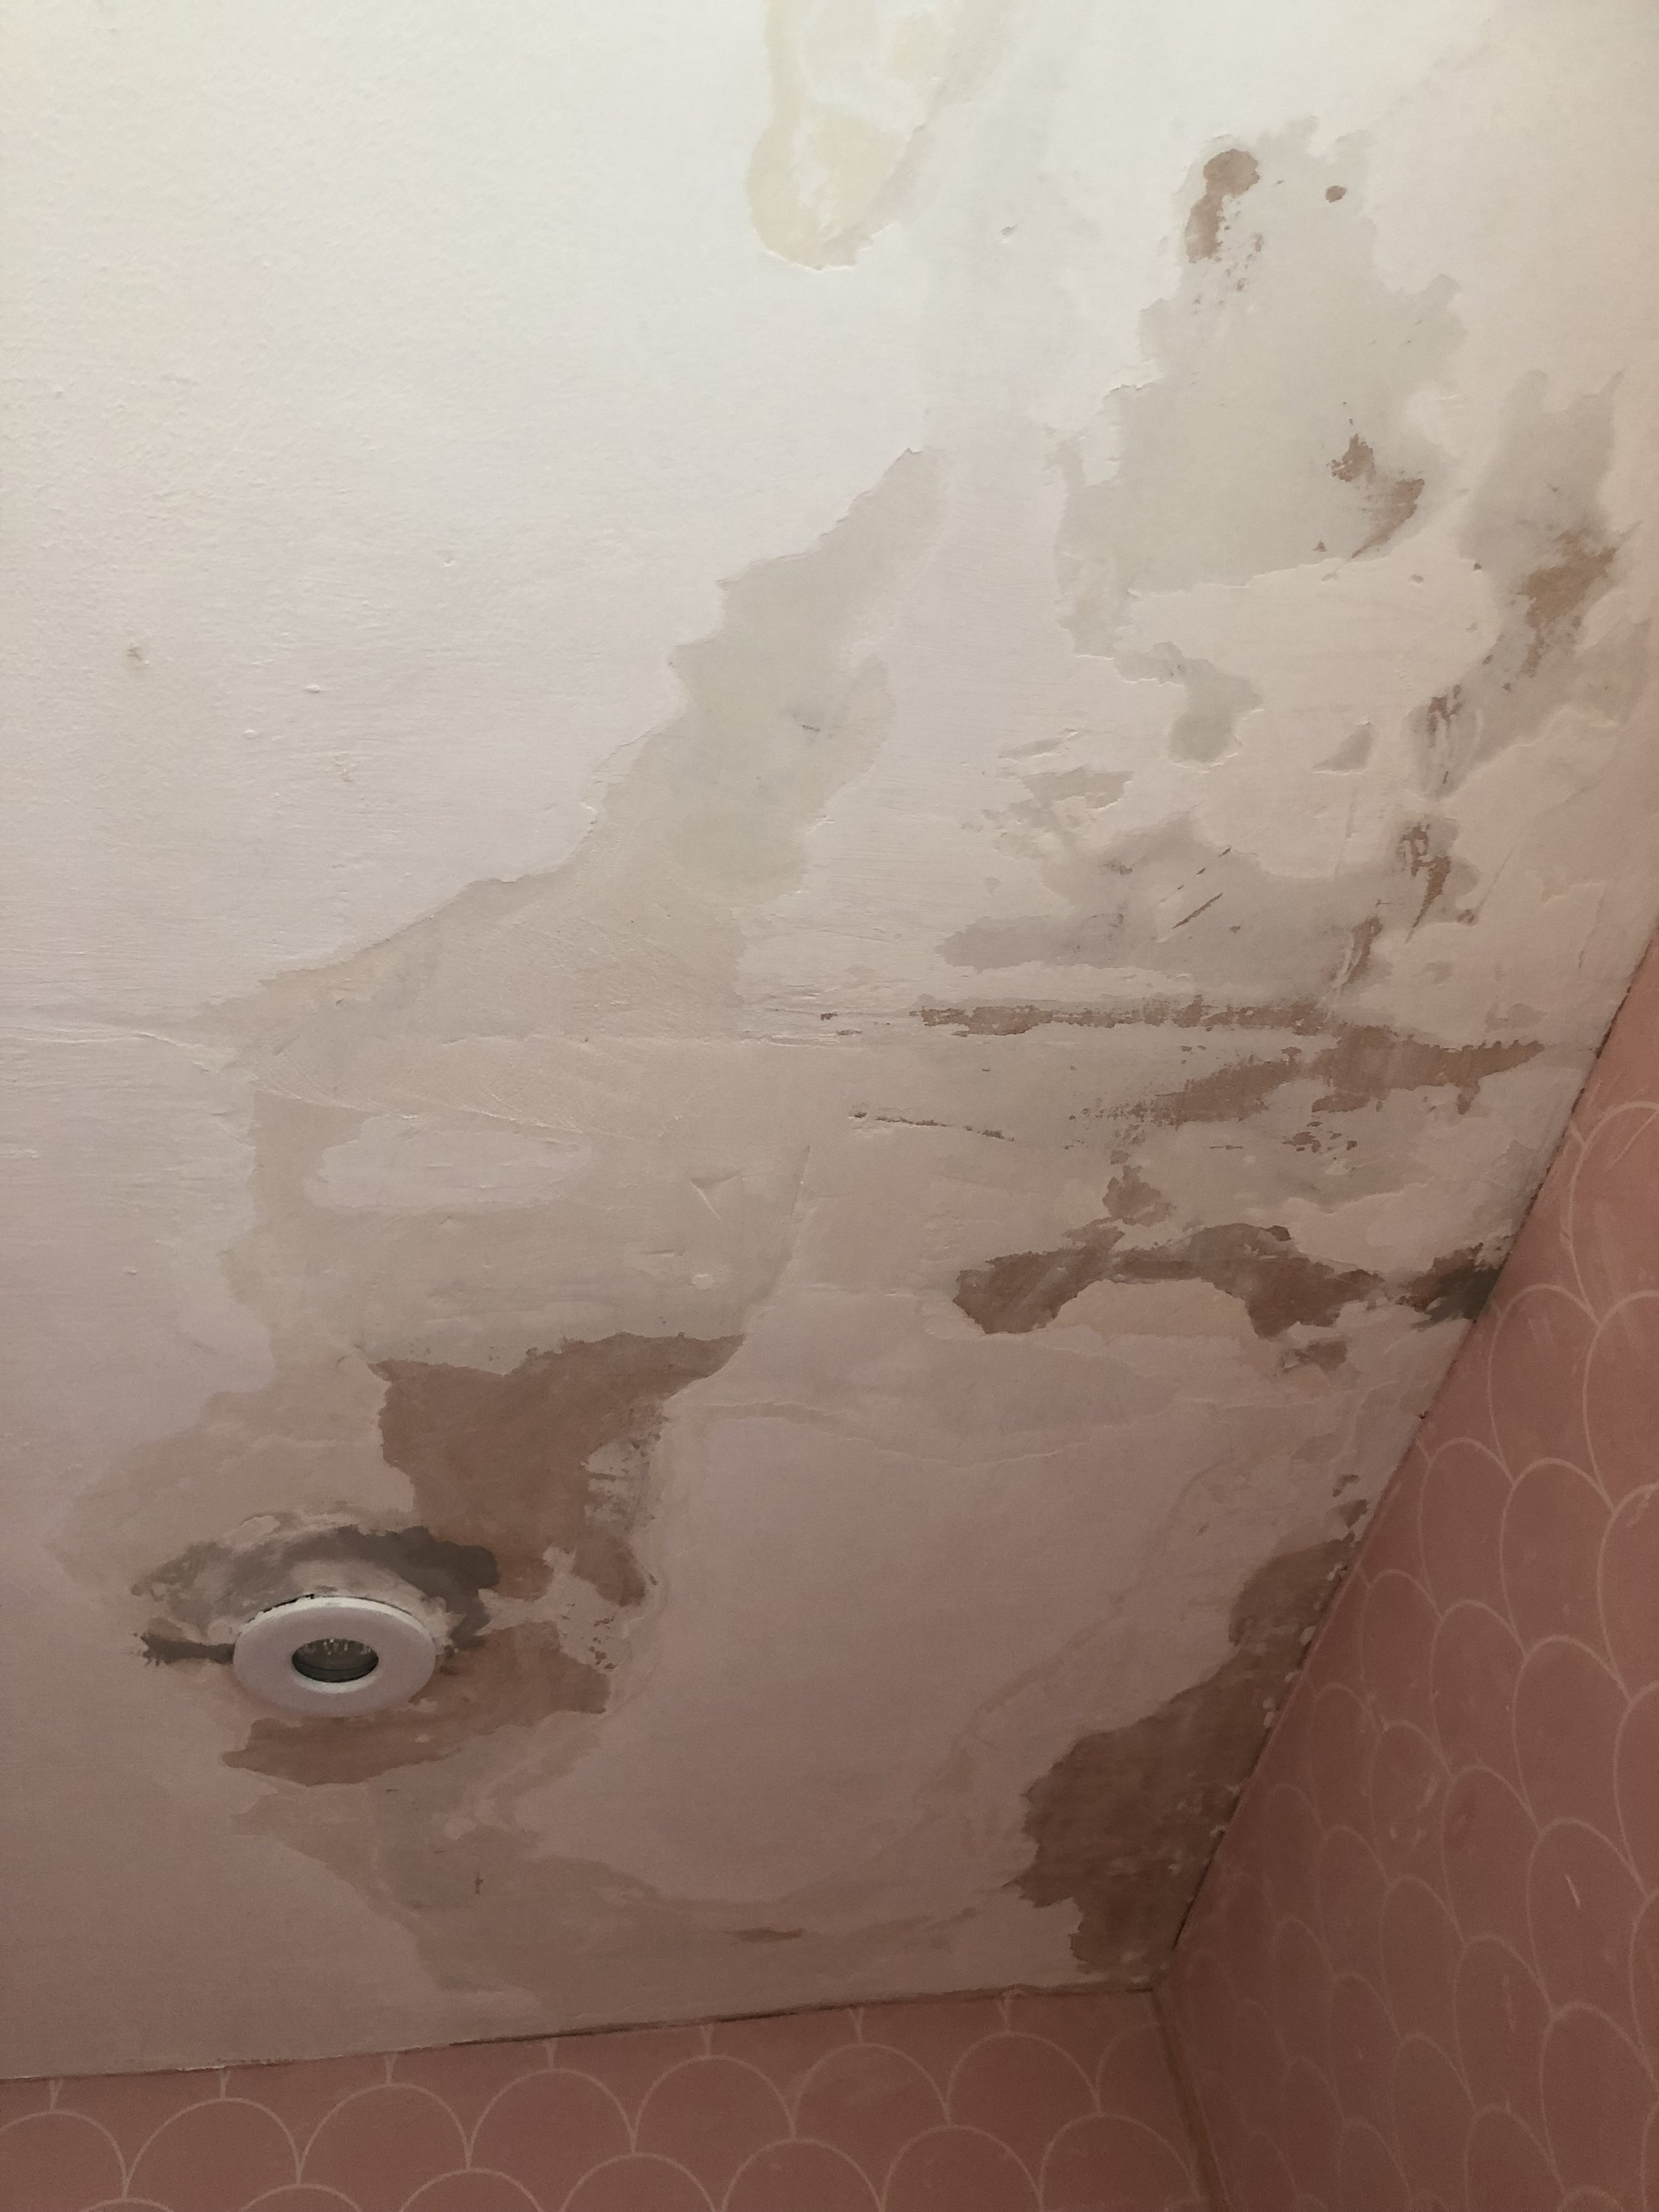 How To Repair A Peeling Bathroom Wall Or Ceiling Melanie Lissack Interiors